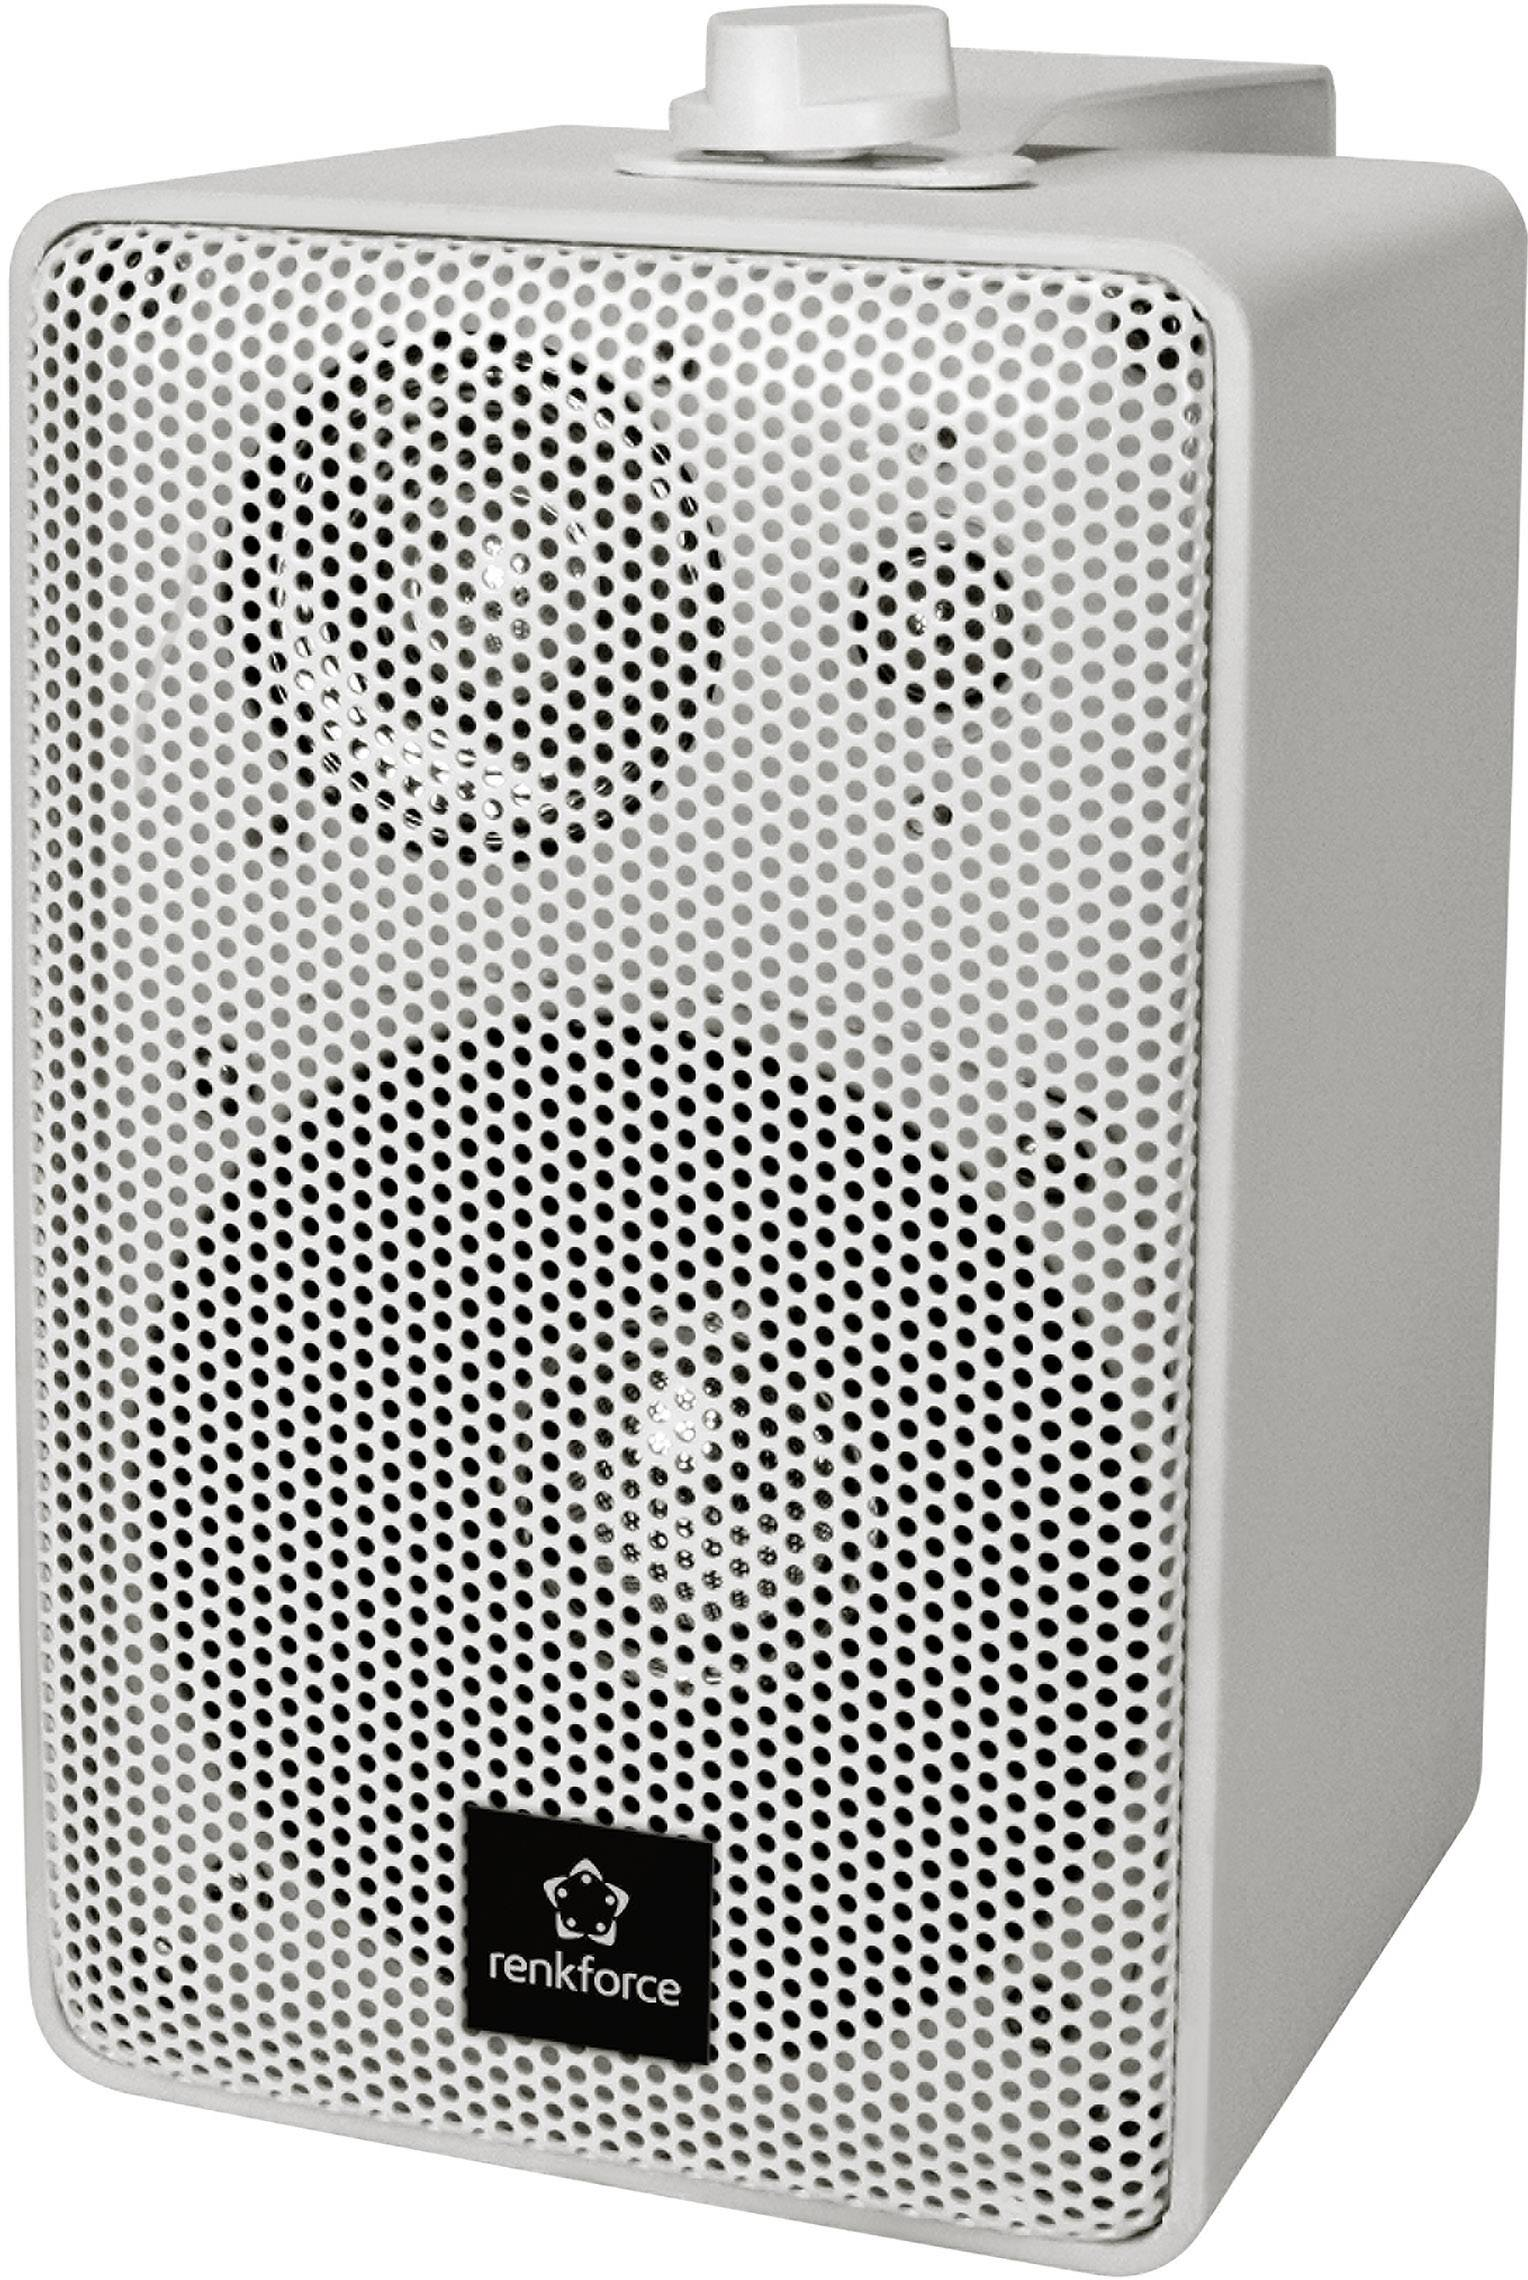 Regálový reproduktor Renkforce RL100W WH, 90 do 20000 Hz, 100 W, 1 pár, biela